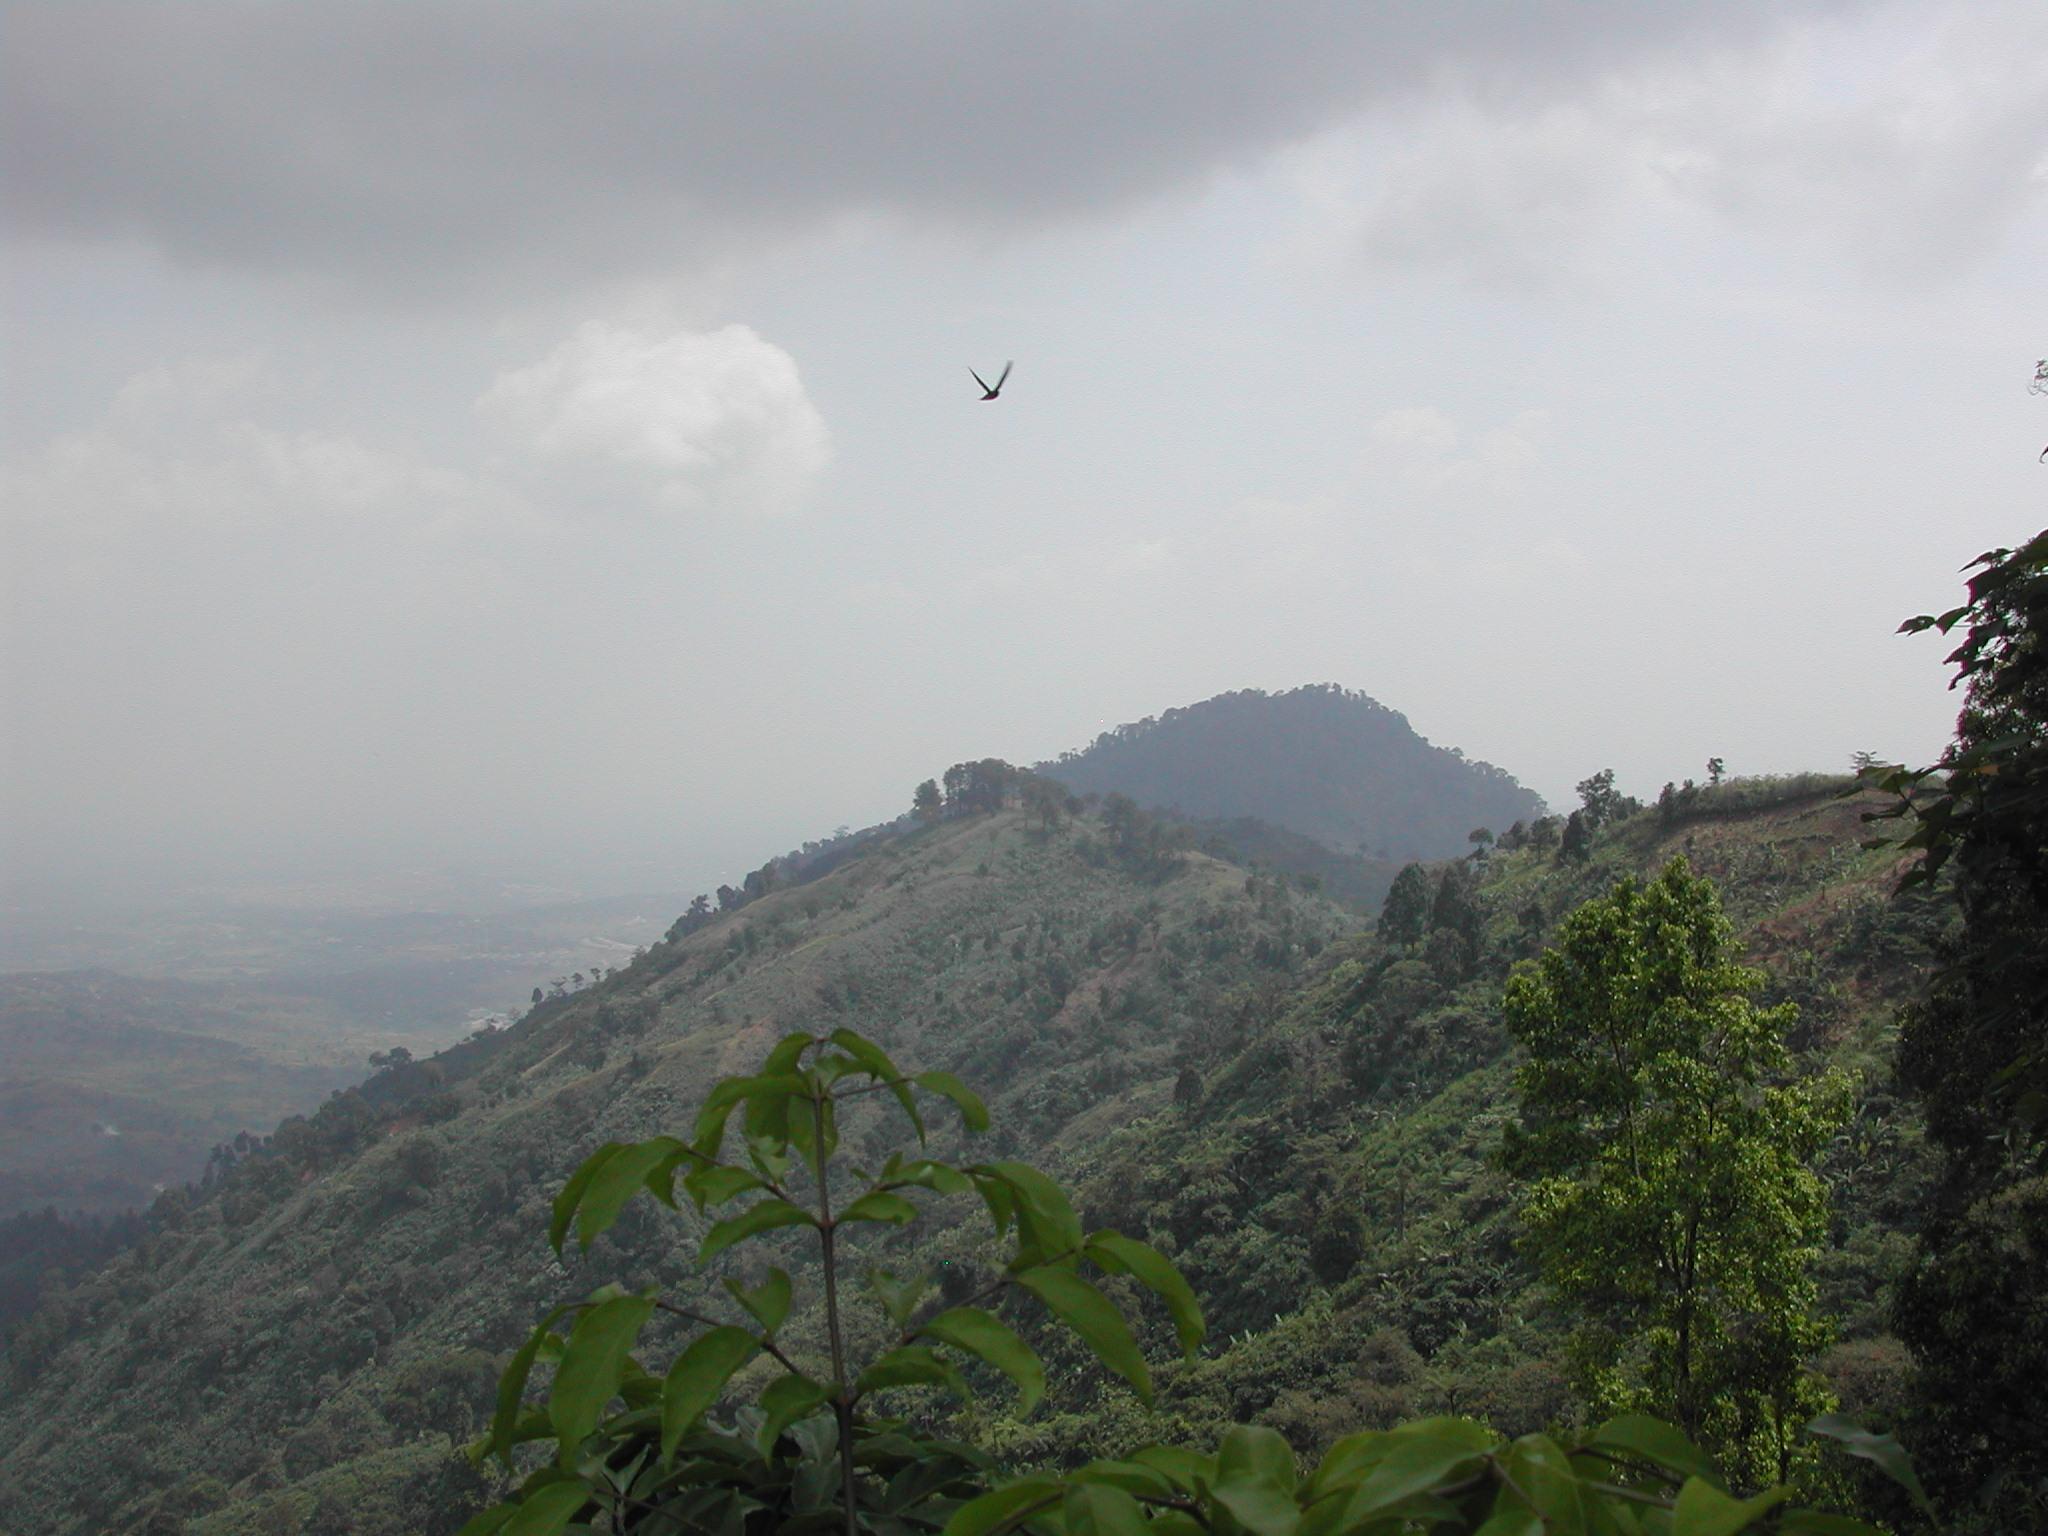 Forest landscape photo